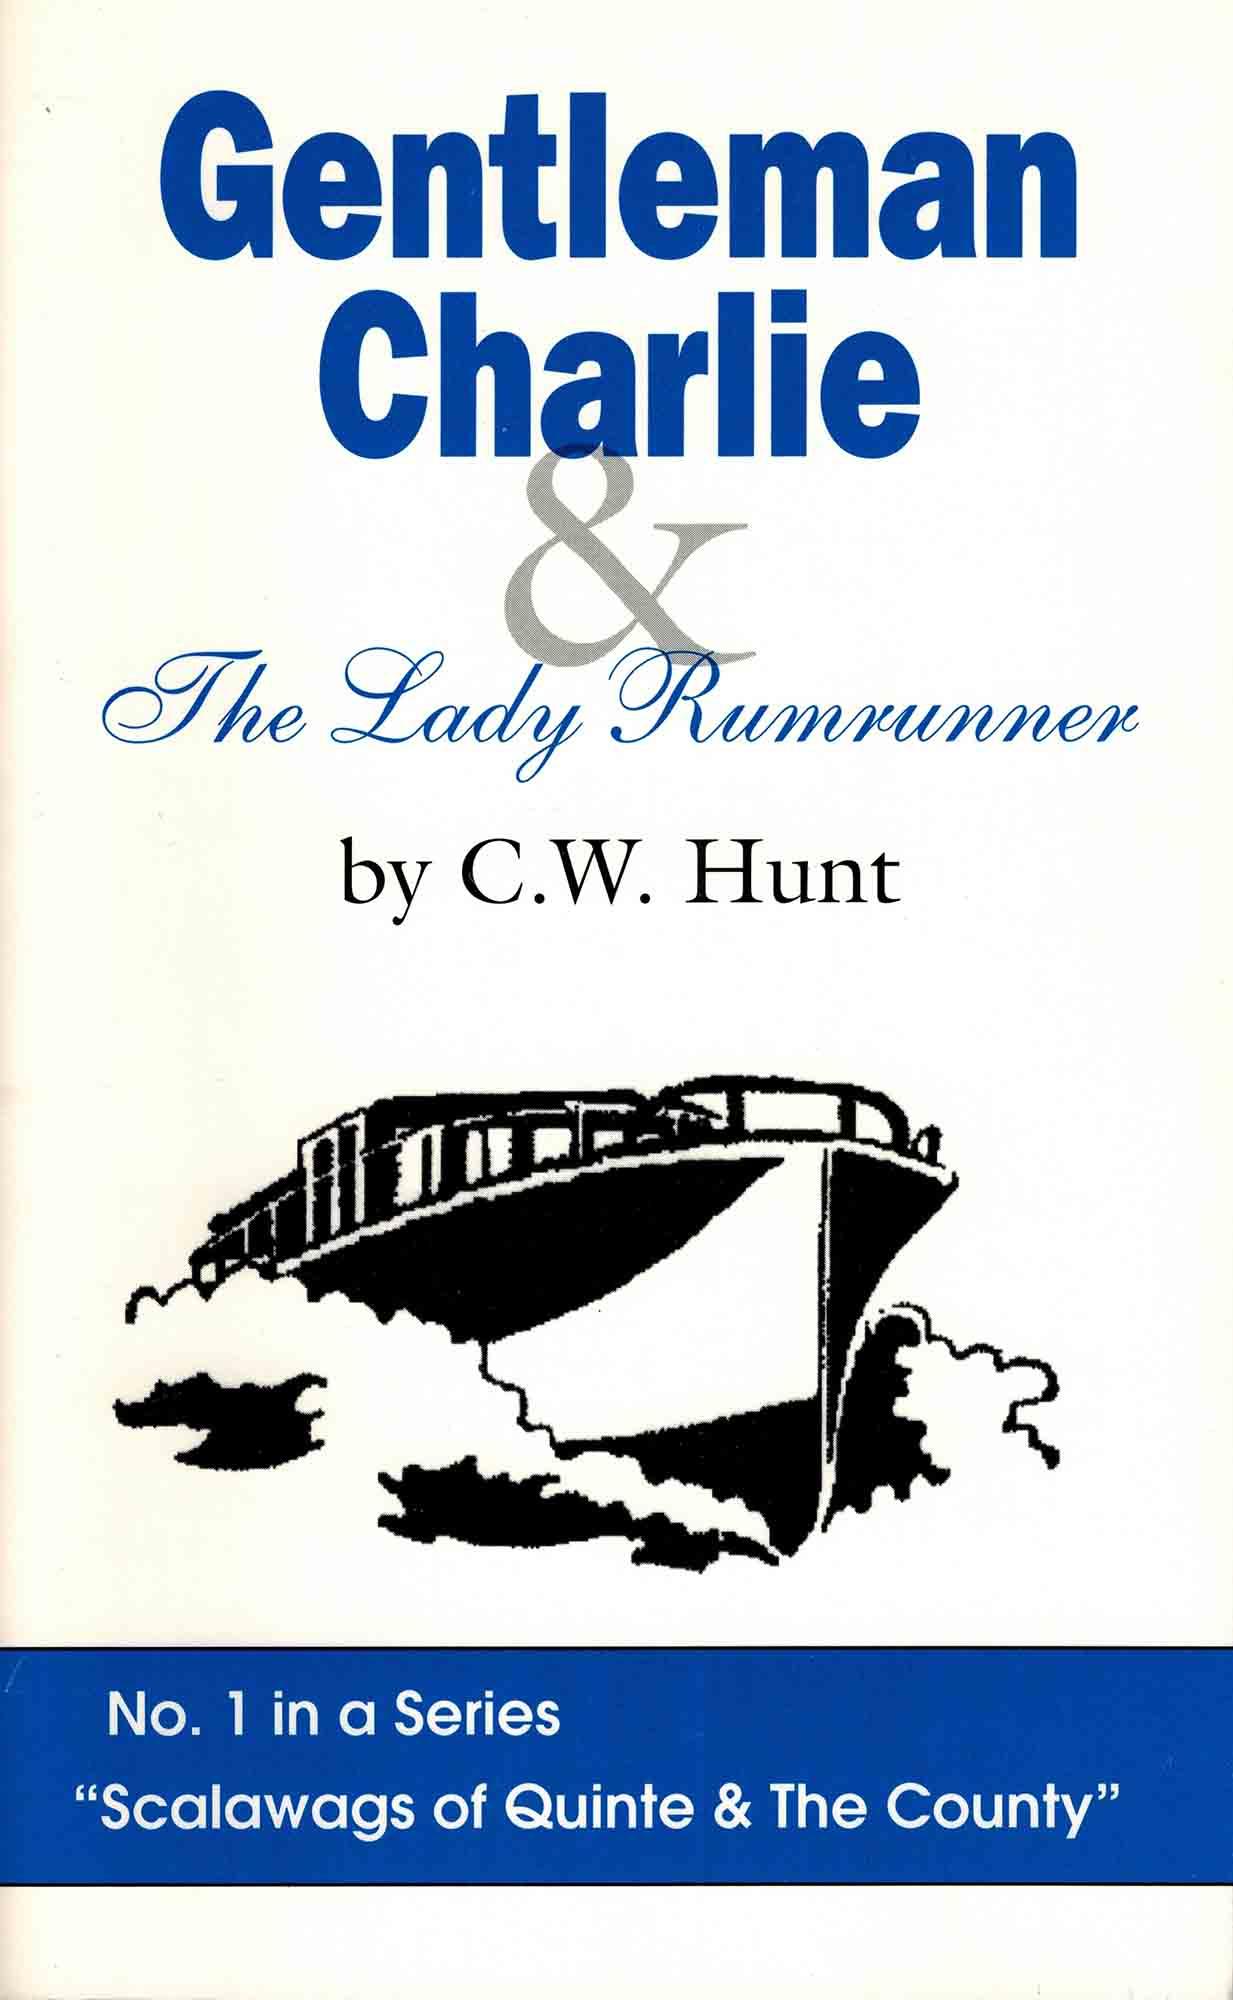 Book cover of  Gentleman Charlie .